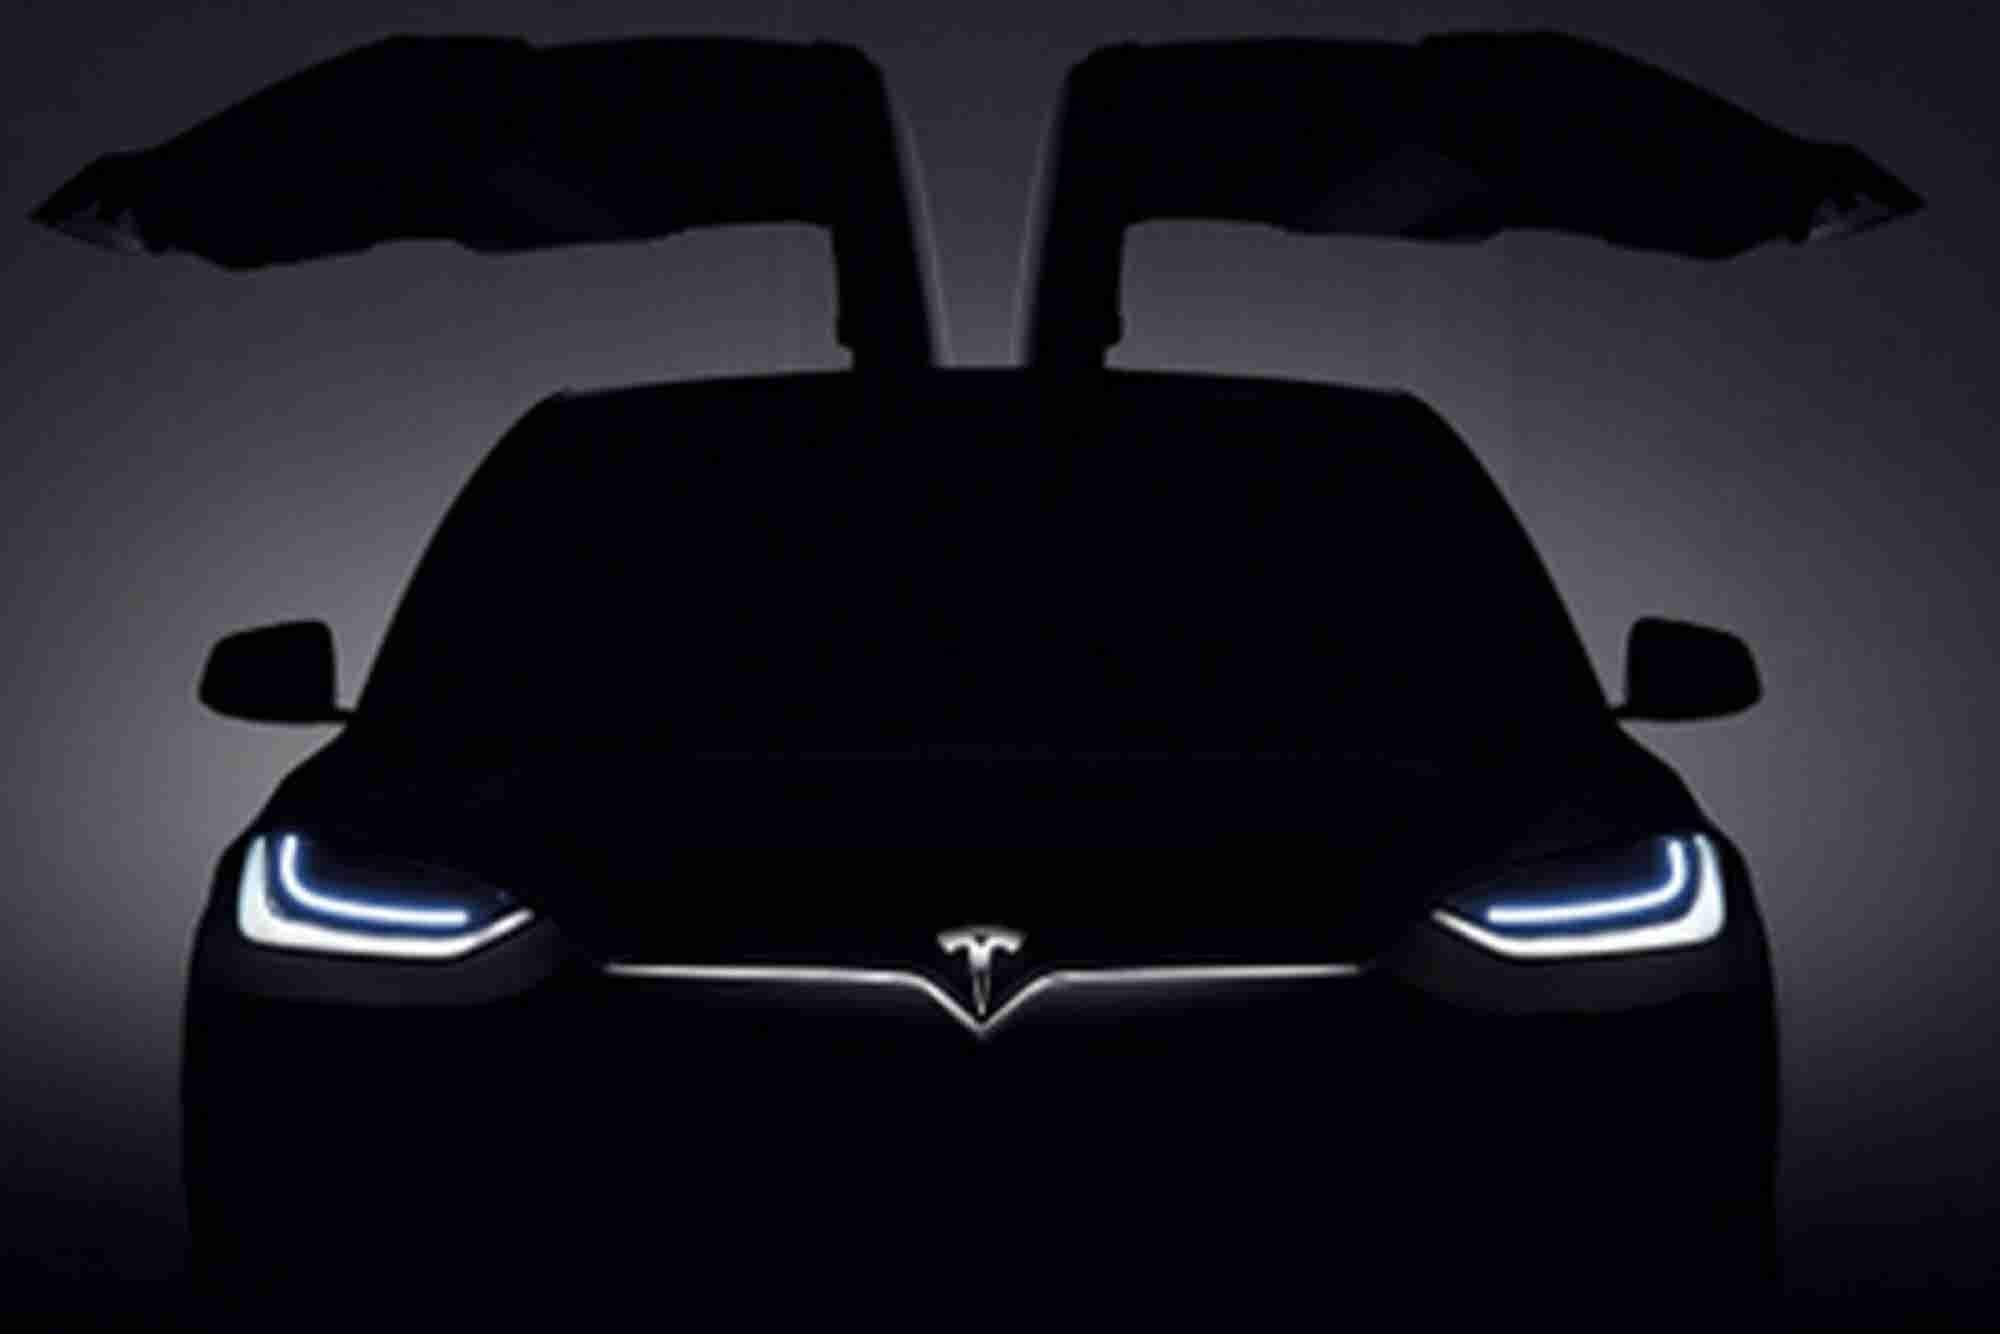 A Look at Tesla's New SUV -- Weekly News